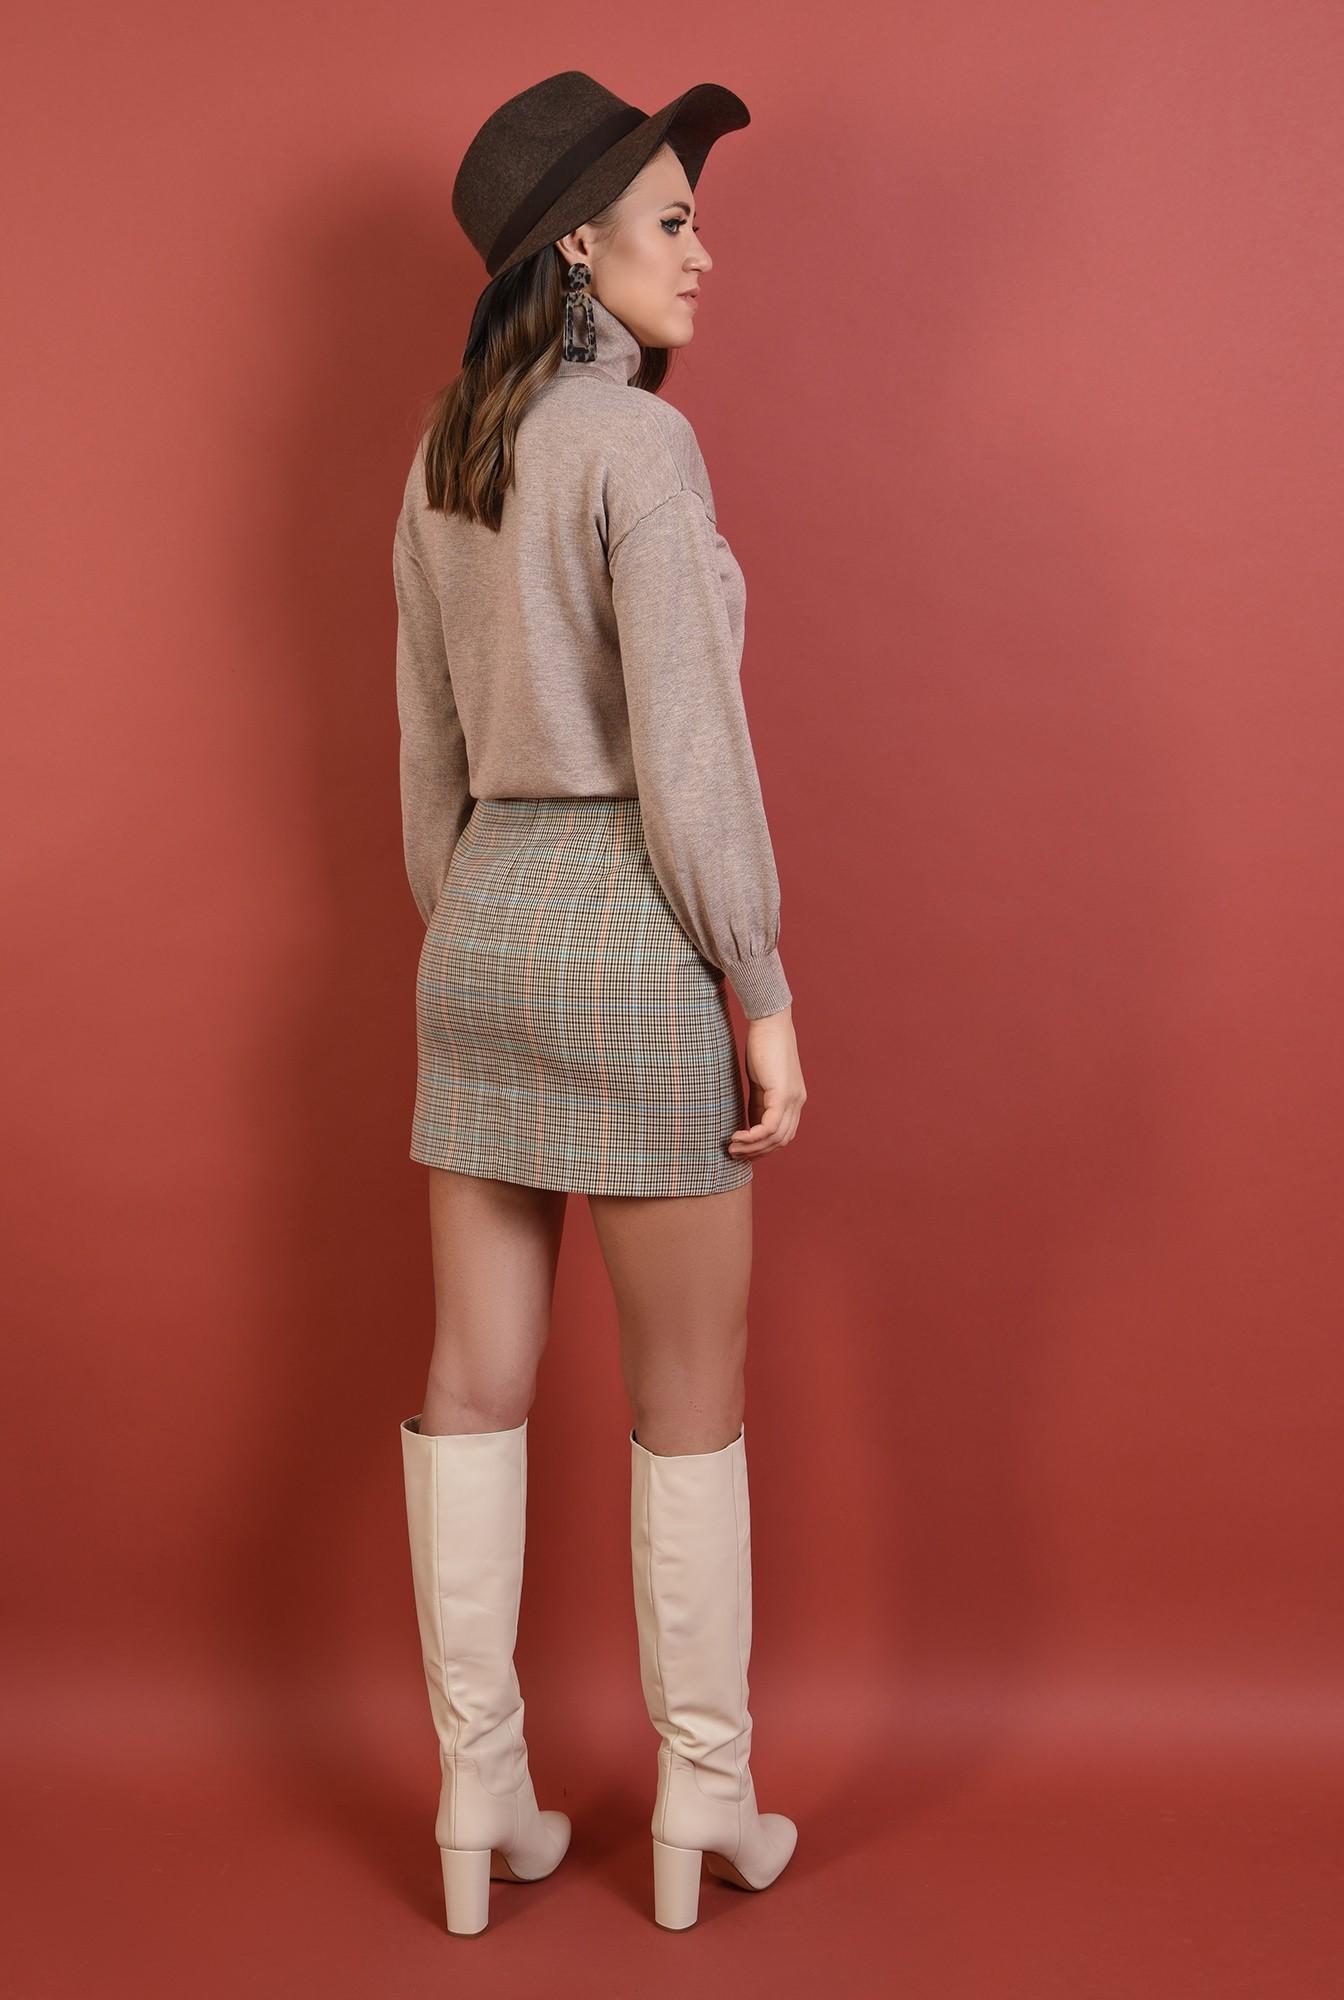 1 - pulover Poema, guler rulat, croi drept lejer, tricot, maneci bufante